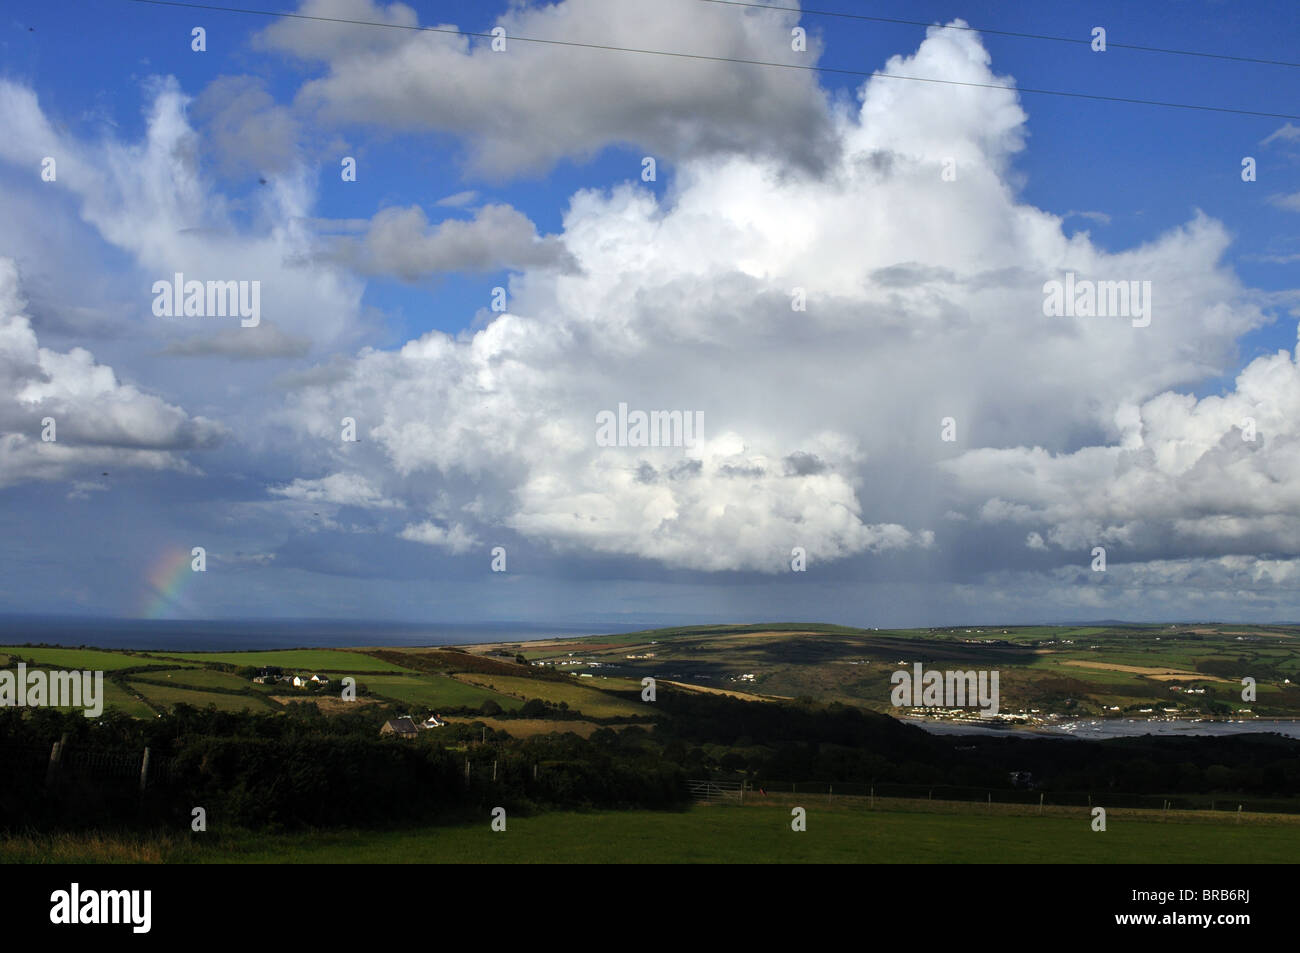 Rainbow and cumulonimbus cloud over Cardigan Bay, St Dogmaels, Pembrokeshire, Wales, United Kingdom - Stock Image